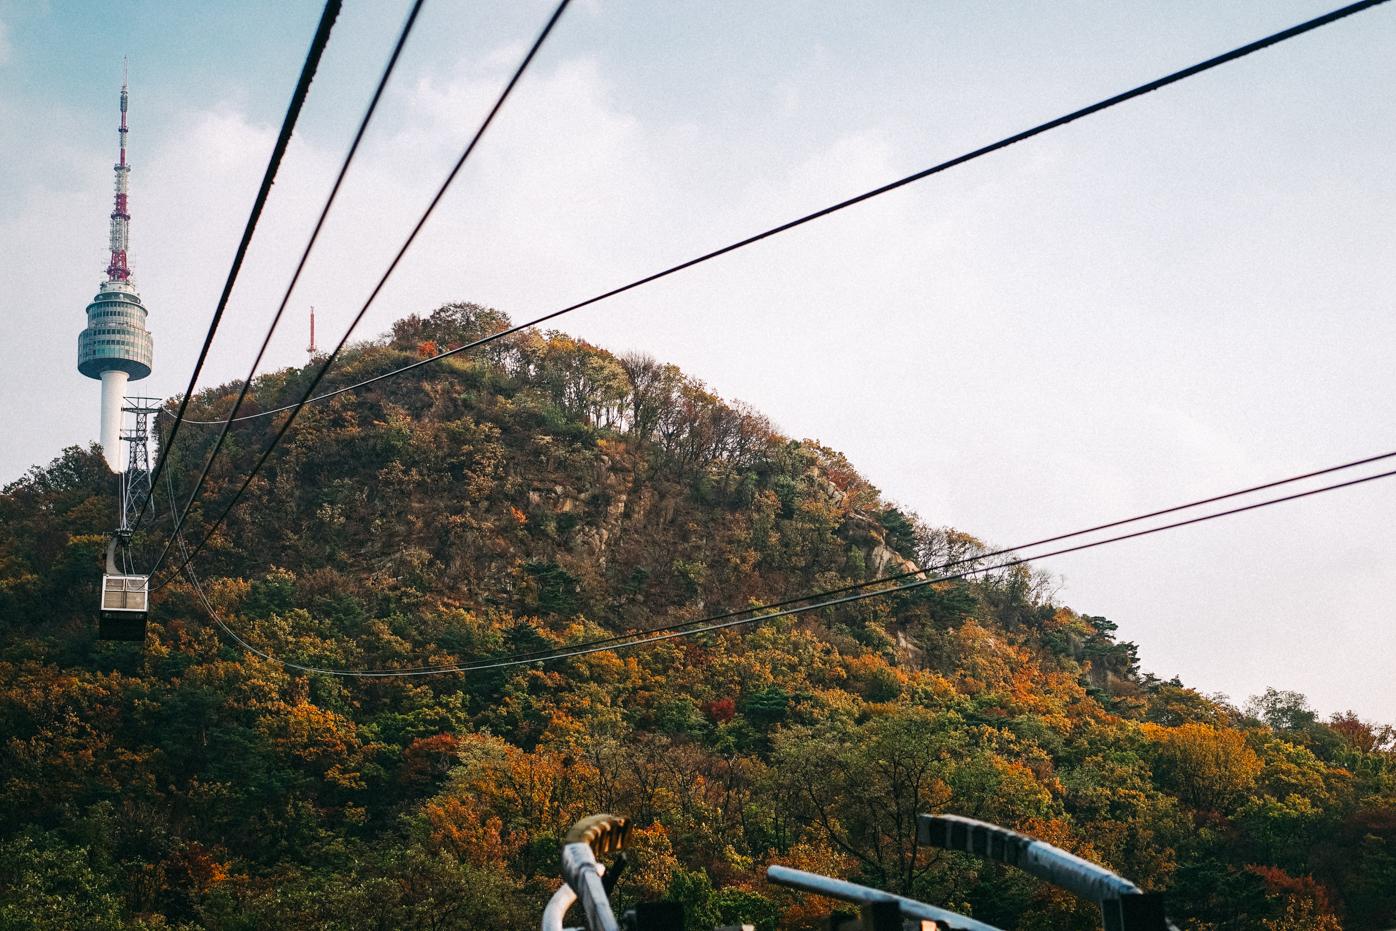 Namsan cable car - Eatandtreats Seoul Trip Diary Namsan Tower In Autumn 2015